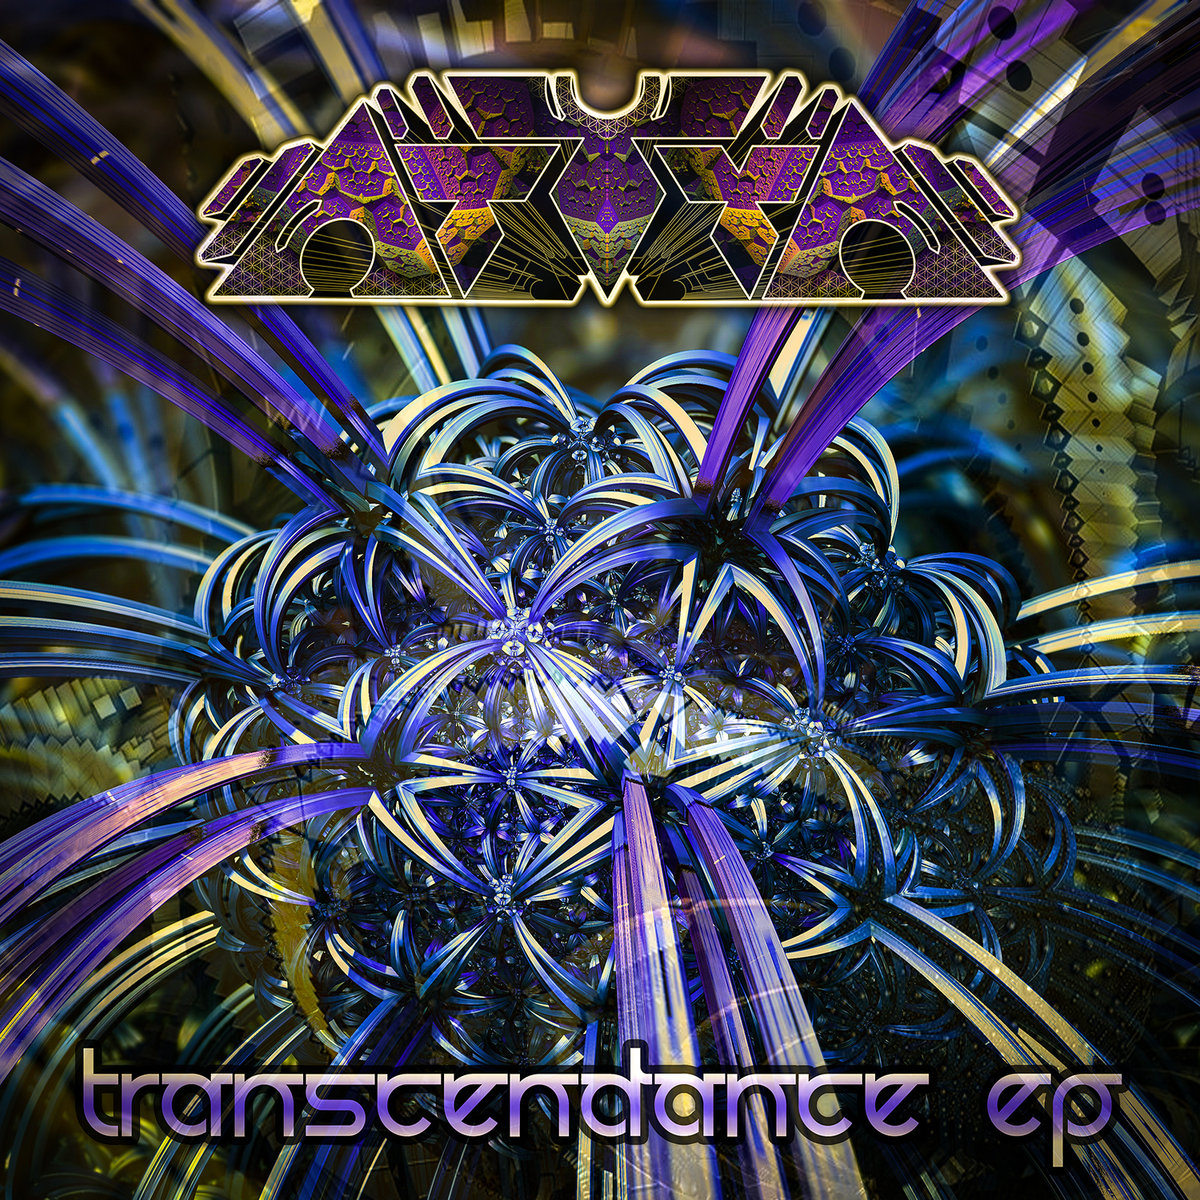 AtYyA - Cygnus @ 'Transcendance' album (432hz, atyya)